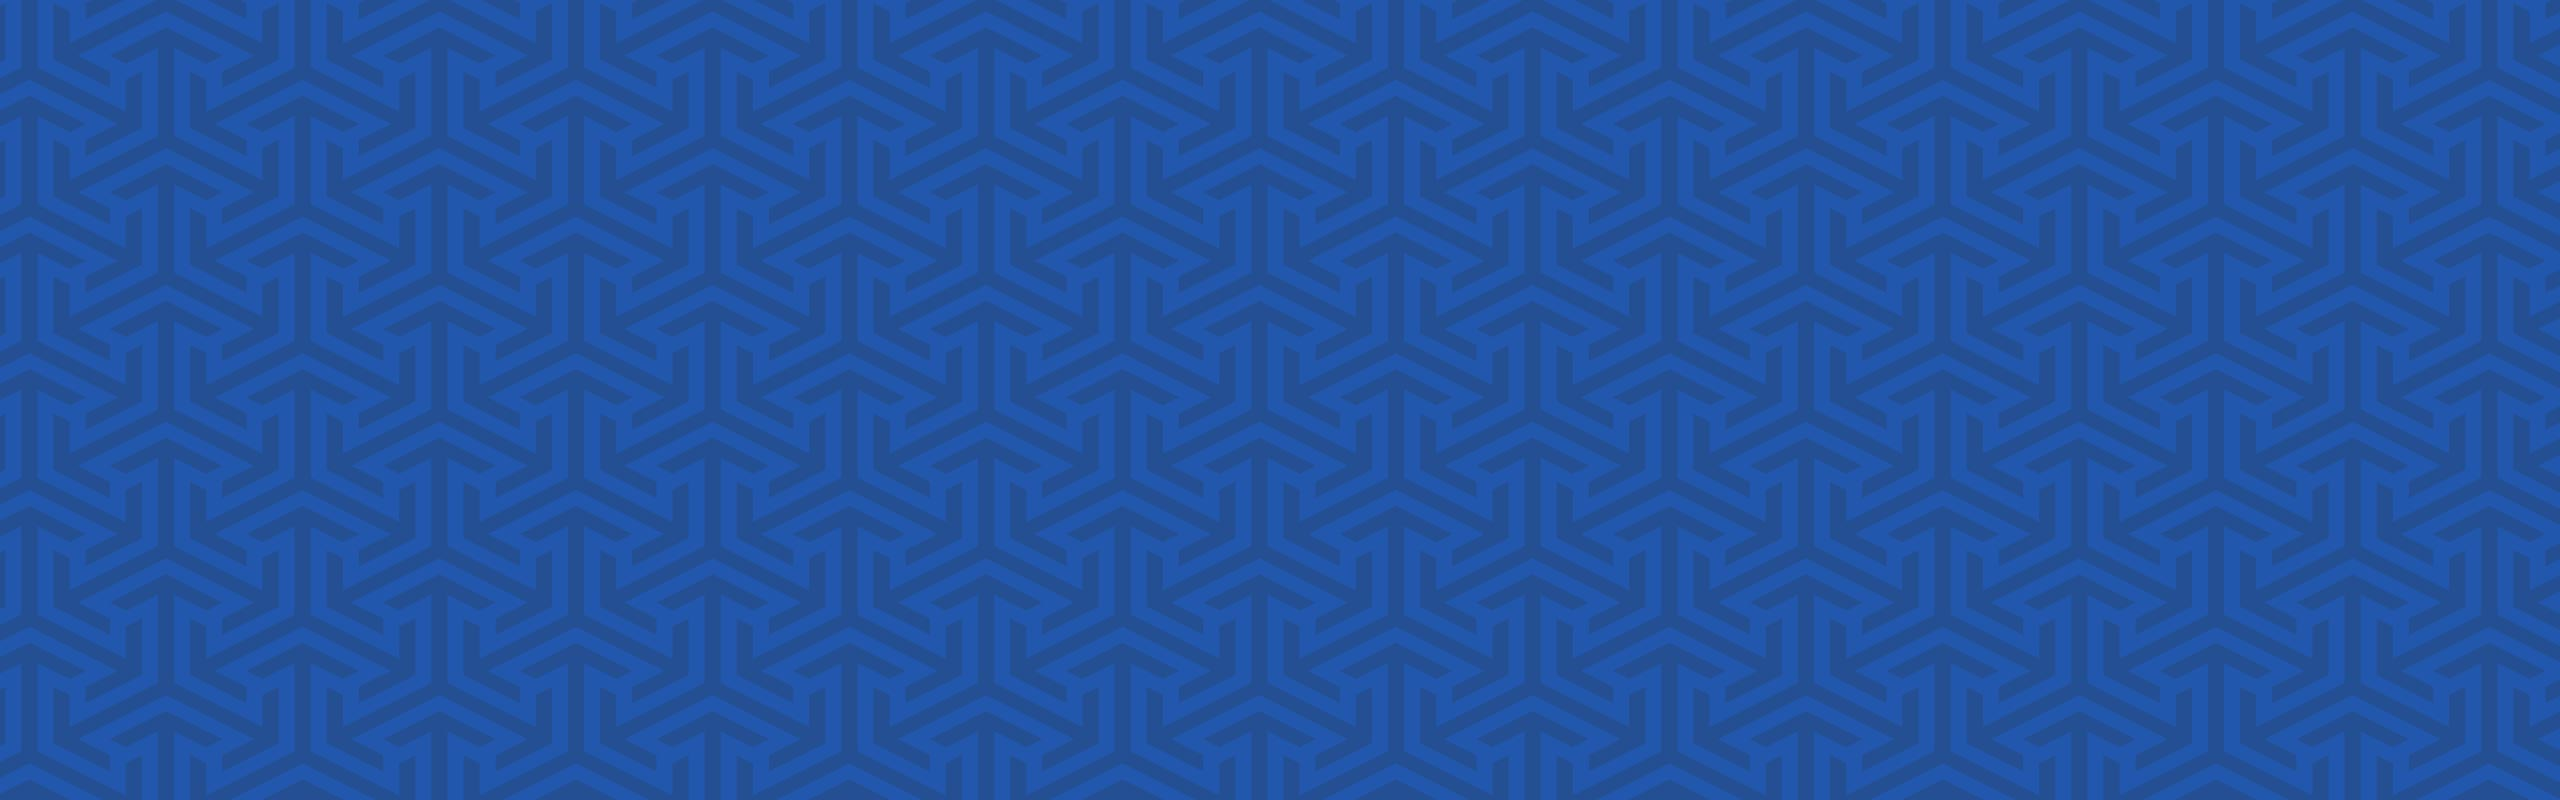 Background_Pattern-Large